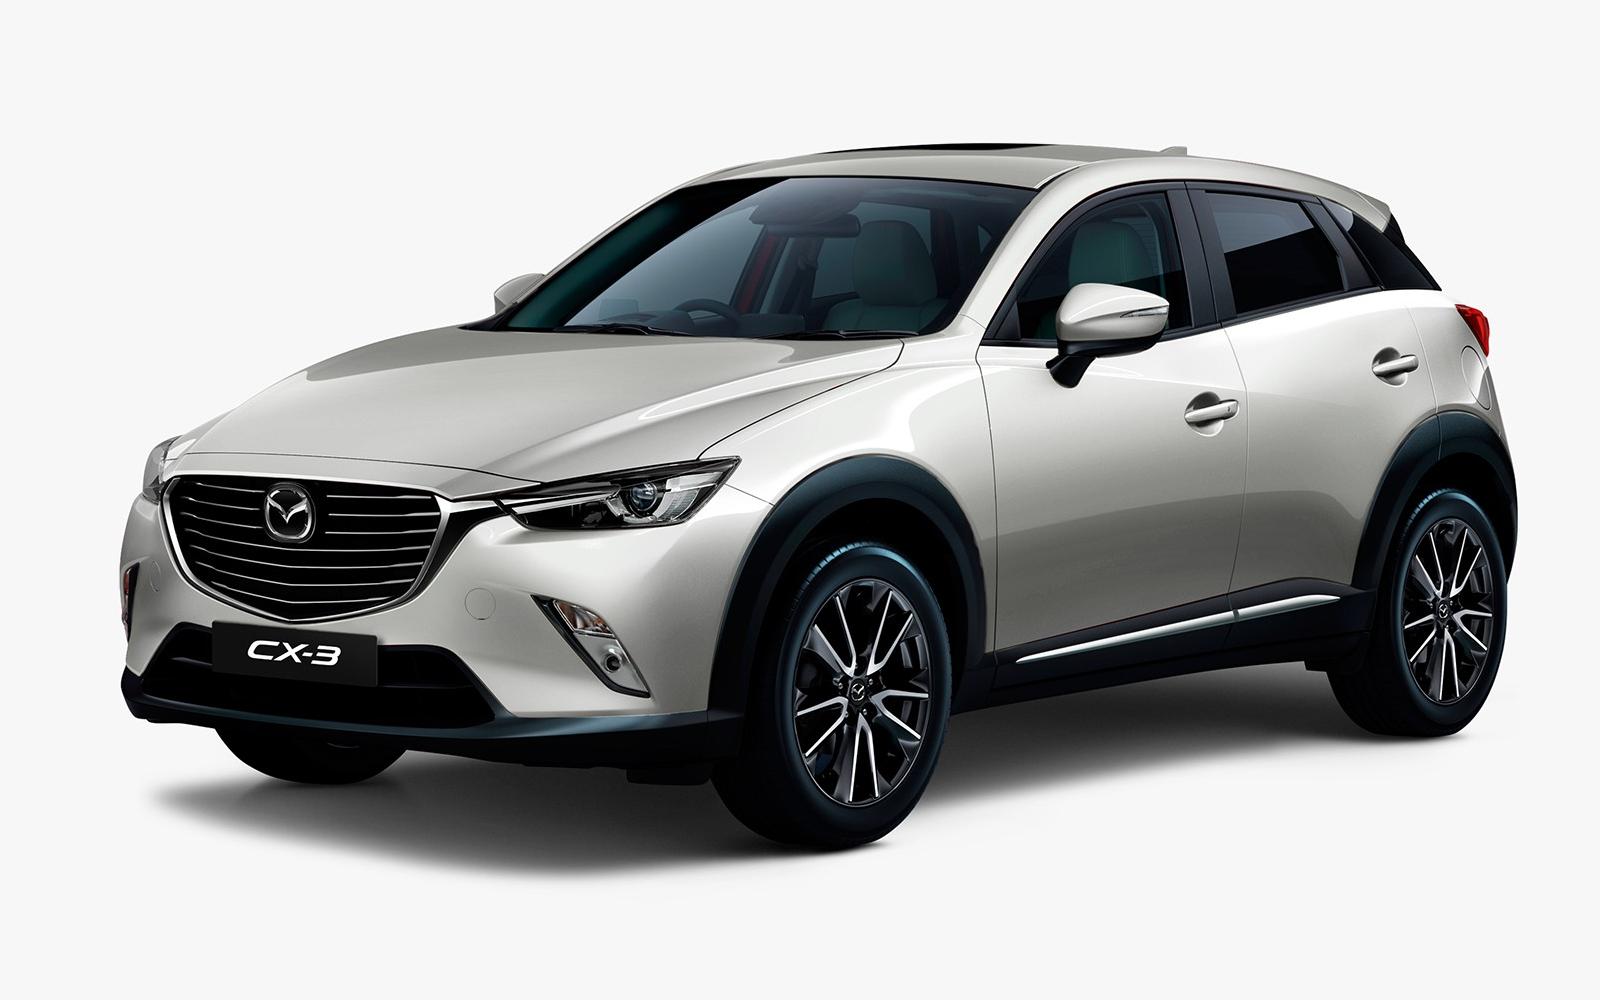 Cx 3 Vs Hrv >> Mazda Cx 3 Vs Honda Hrv.html | Autos Post